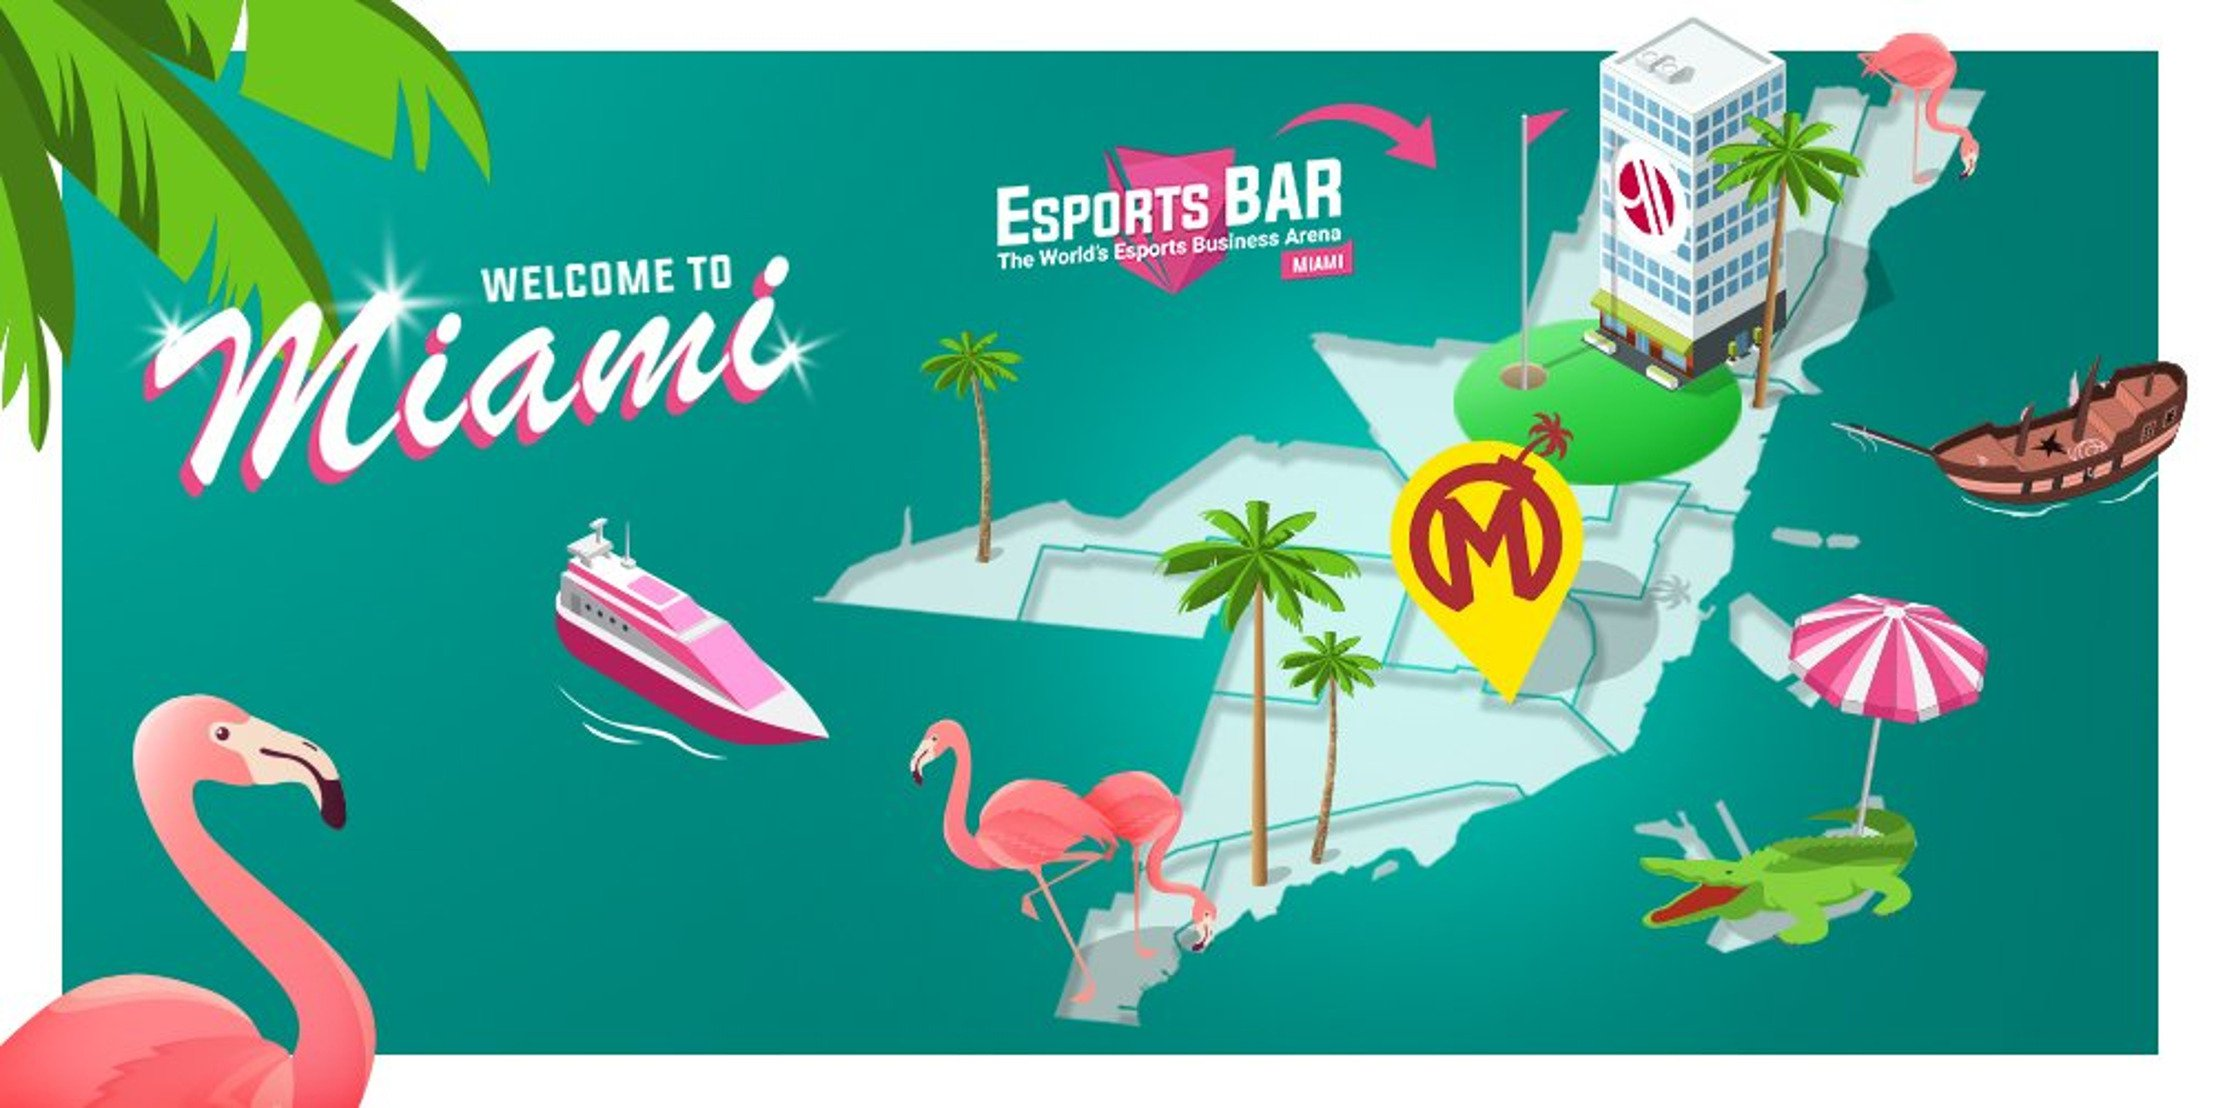 WePlay! Esports is a sponsor of Esports BAR Miami 2019